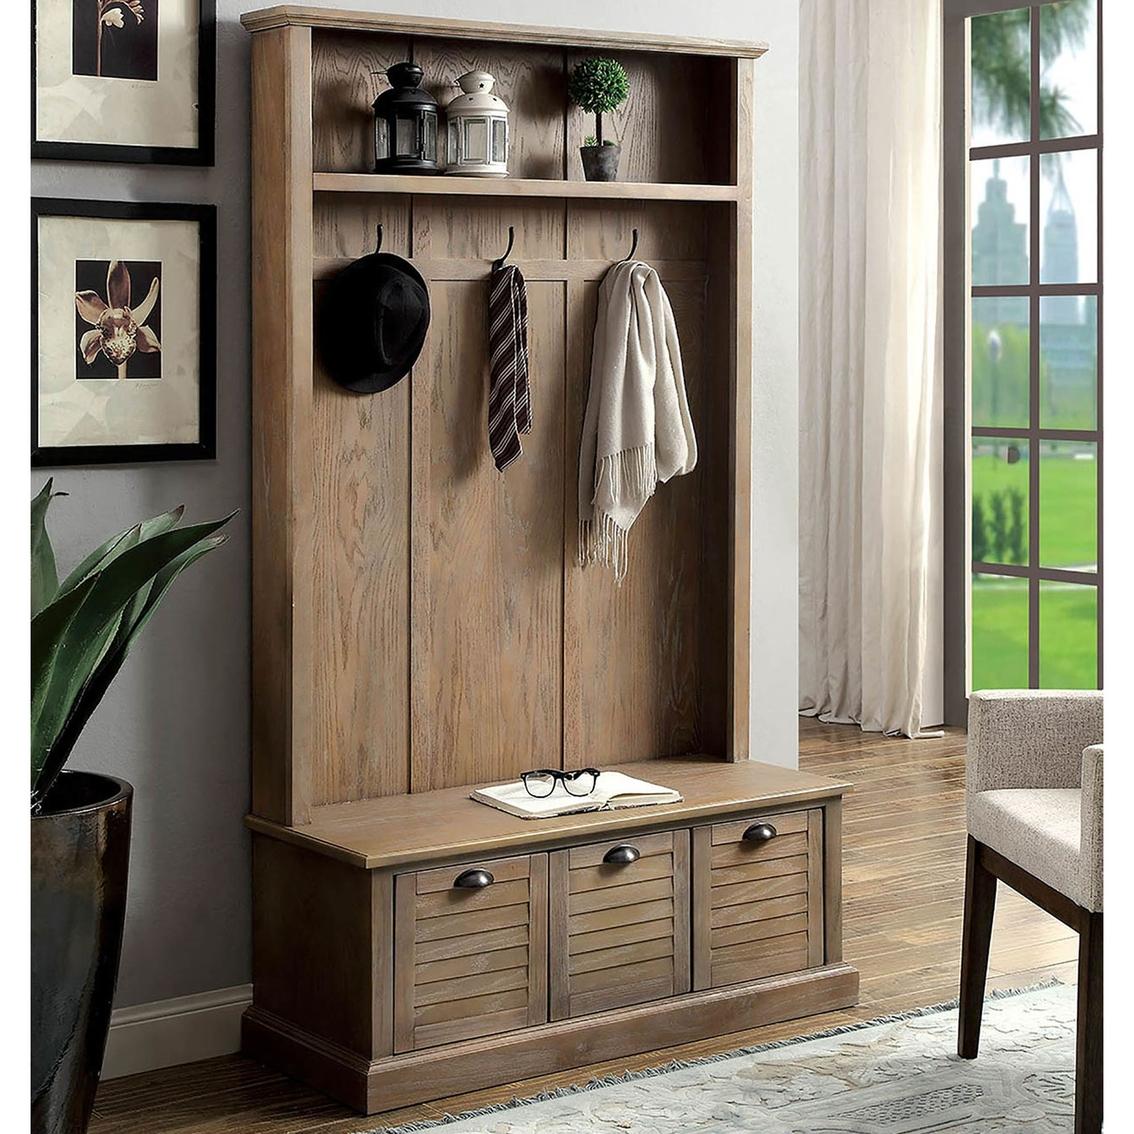 Furniture Of America Wineglo Coat Rack   Entry Furniture